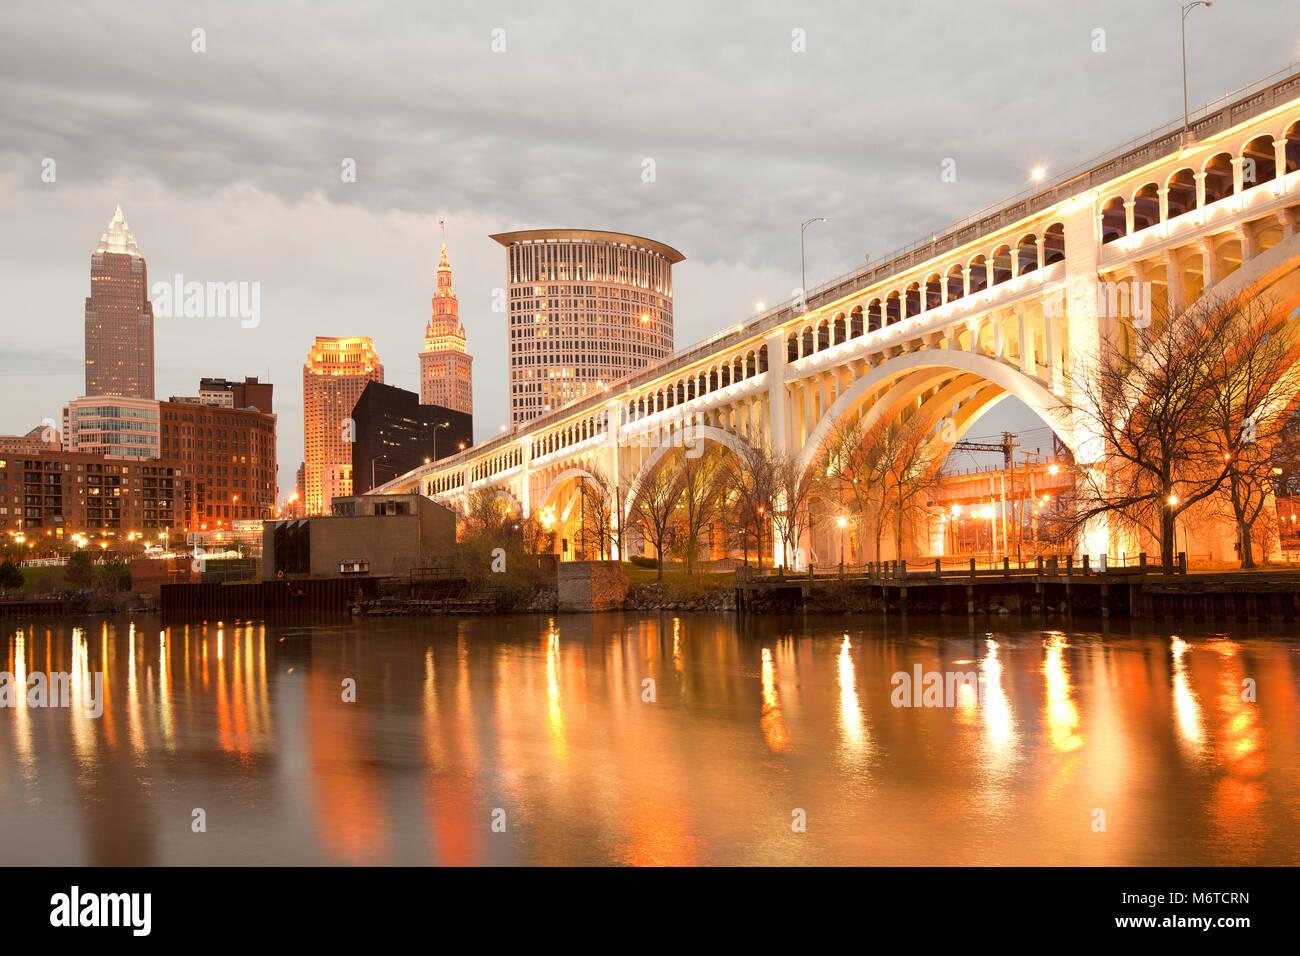 Detroit Superior Bridge over Cuyahoga River and downtown skyline, Cleveland, Ohio, USA - Stock Image